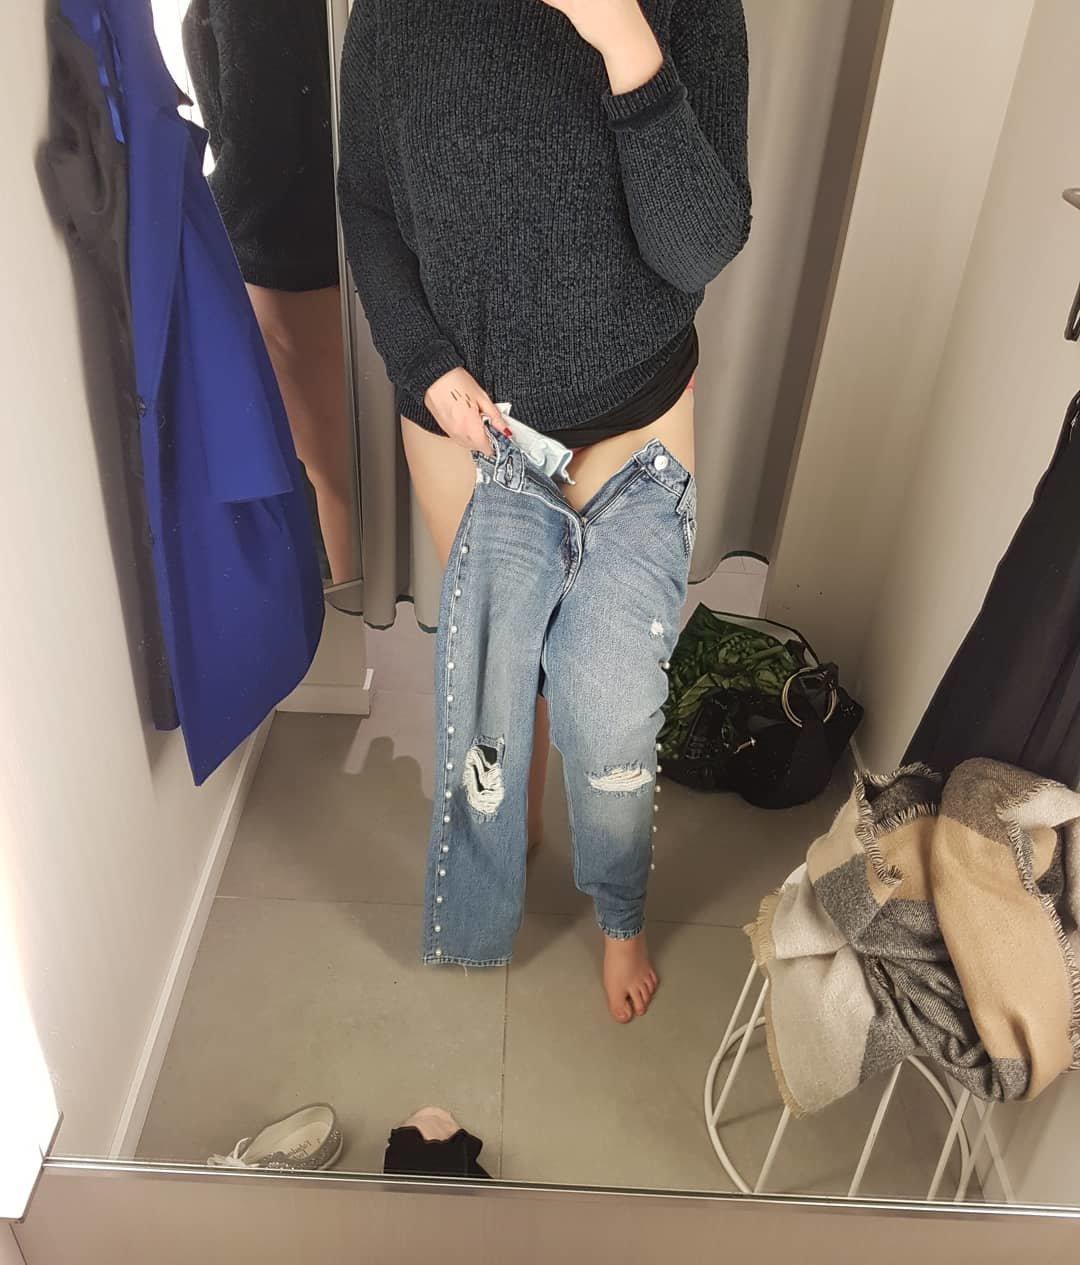 Weaker sales for H&M